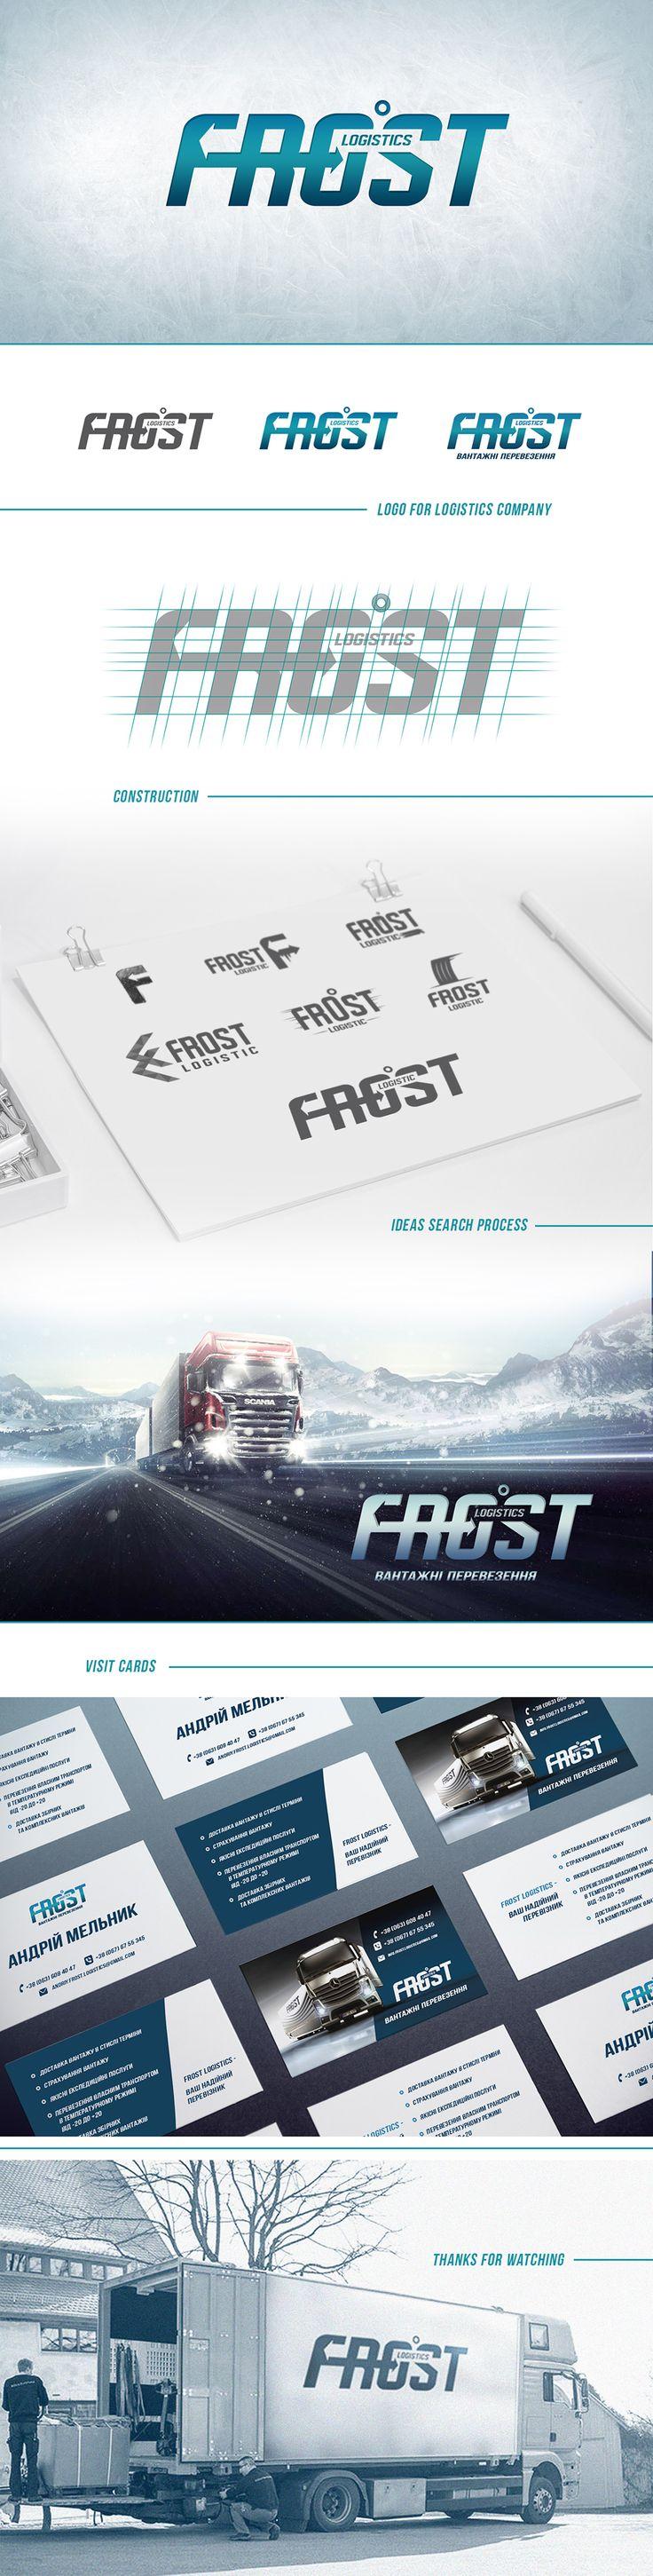 FROST logistics Logo on Behance #Frost #KEEF #Craft #Design #LogoDesign #Logo #Graphic #Illustration #Work #Art #Style